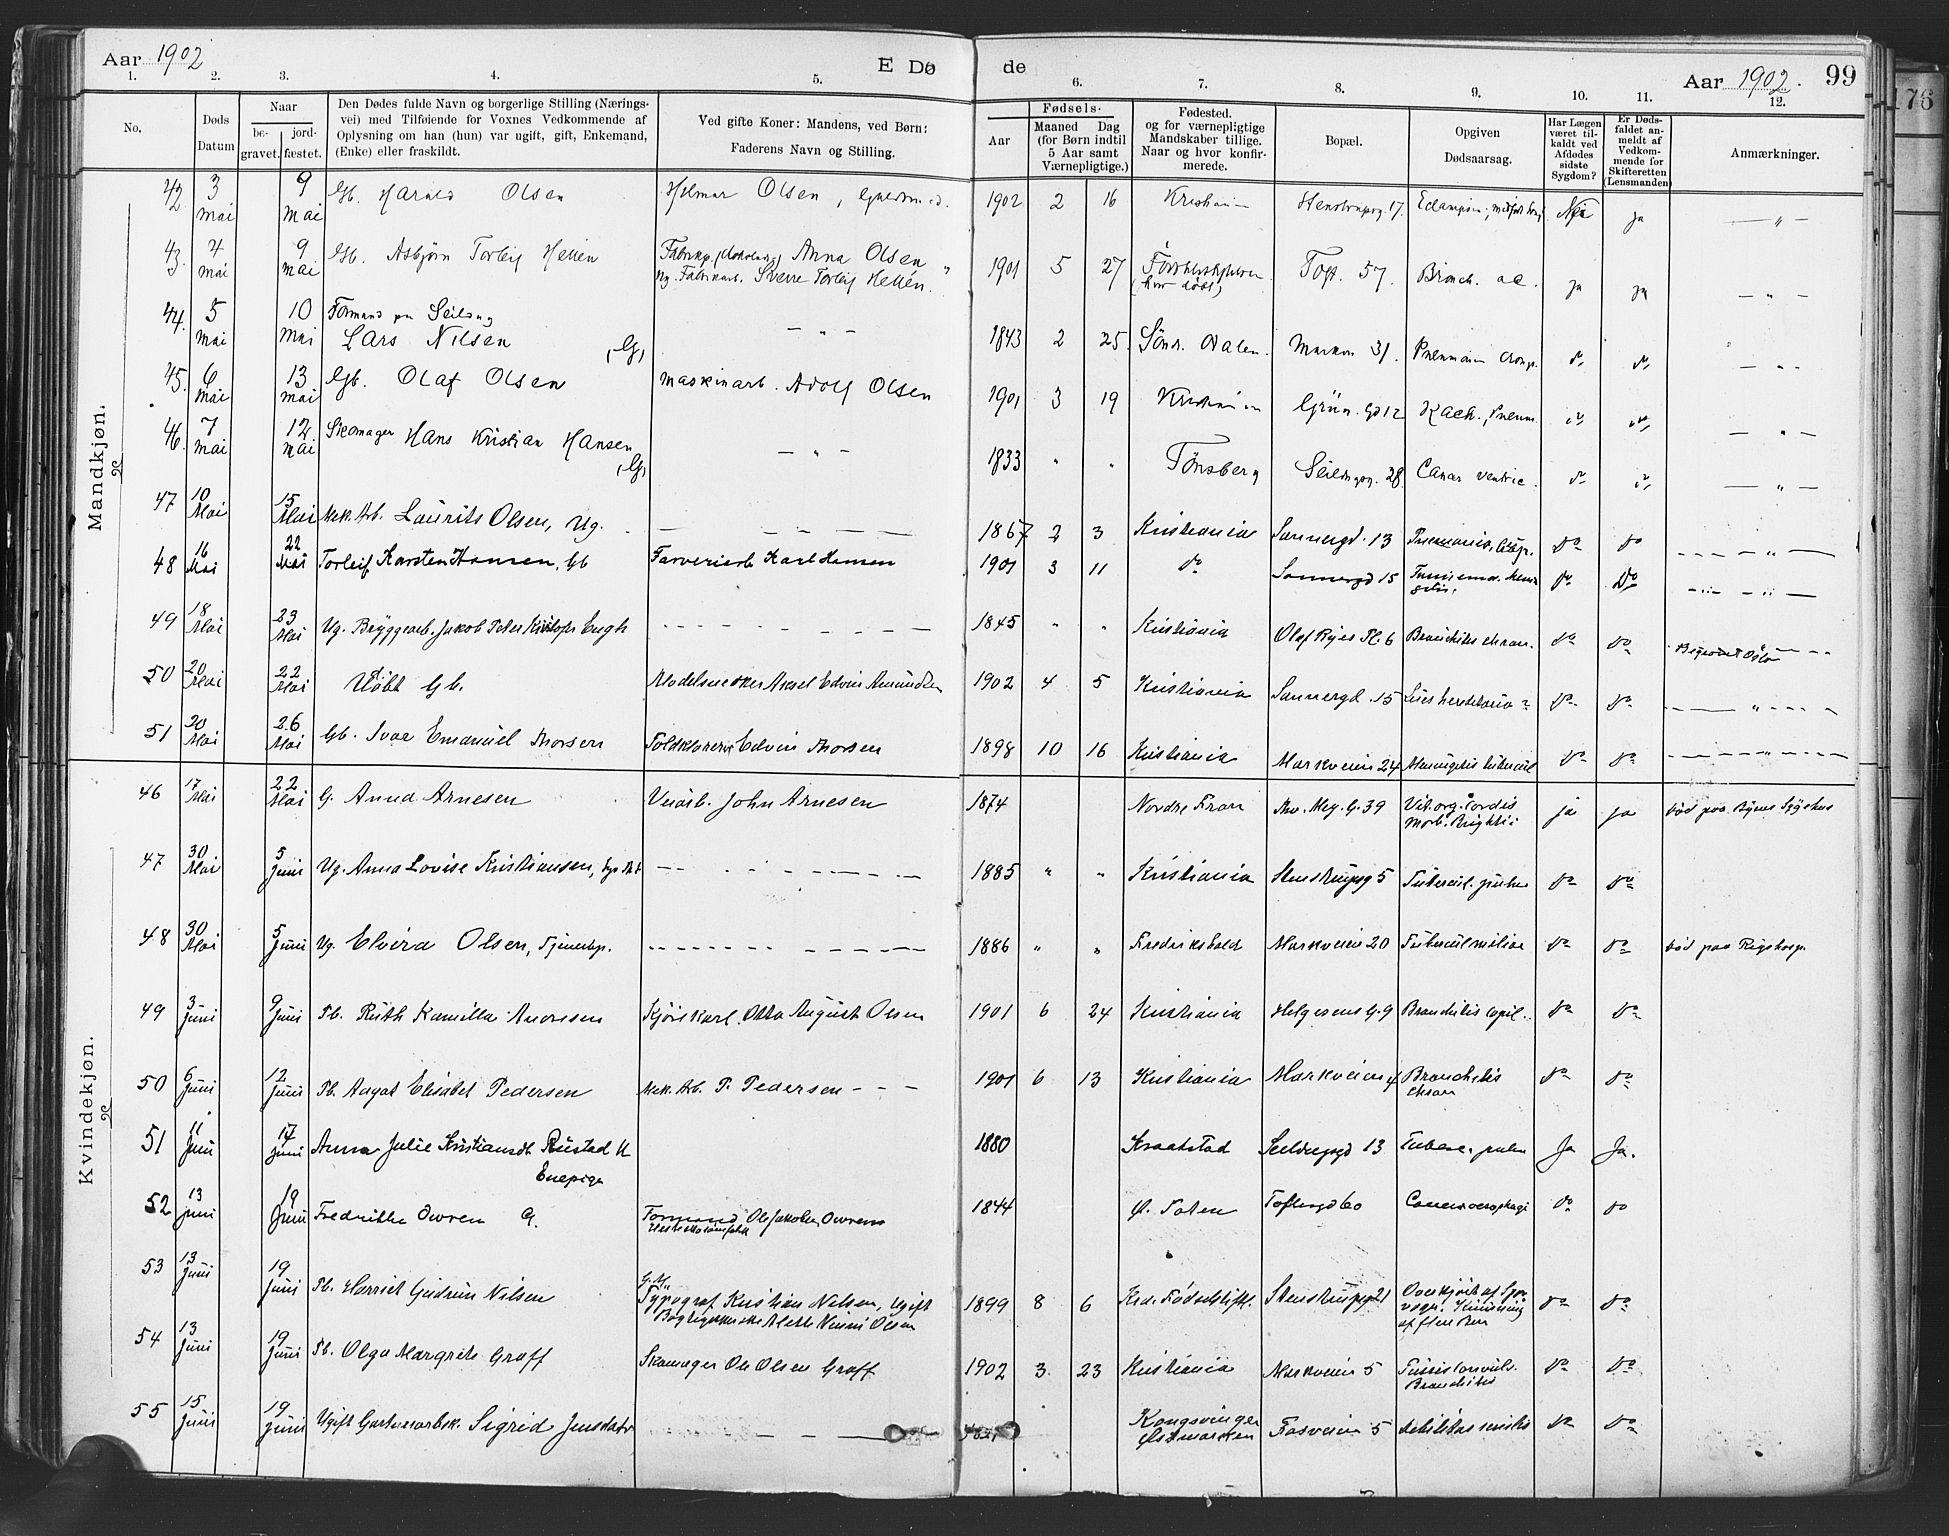 SAO, Paulus prestekontor Kirkebøker, F/Fa/L0012: Parish register (official) no. 12, 1897-1908, p. 99